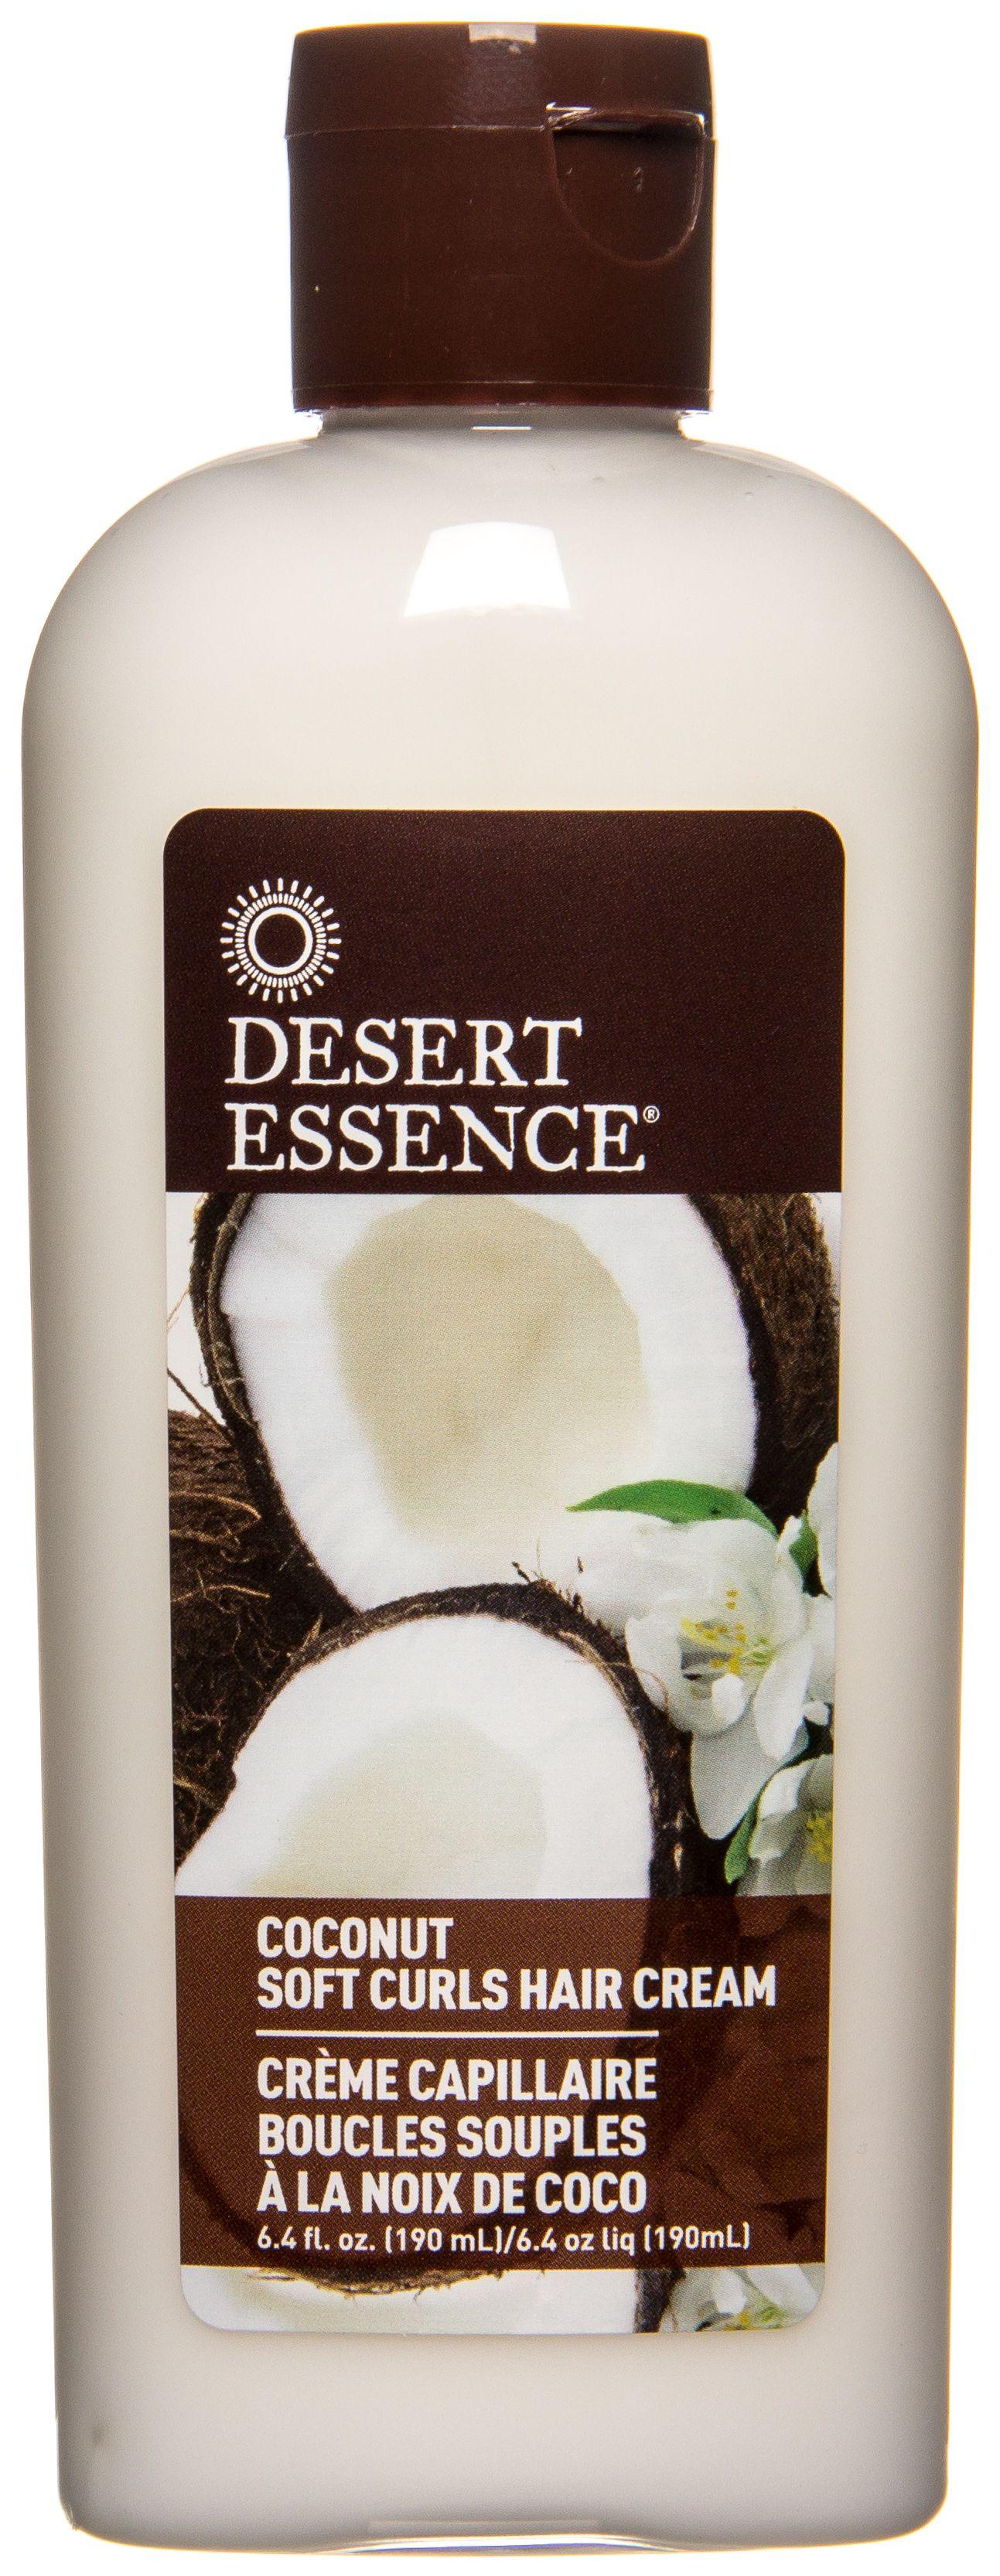 Desert Essence Coconut Soft Curls Hair Cream, 6.4 oz #softcurls